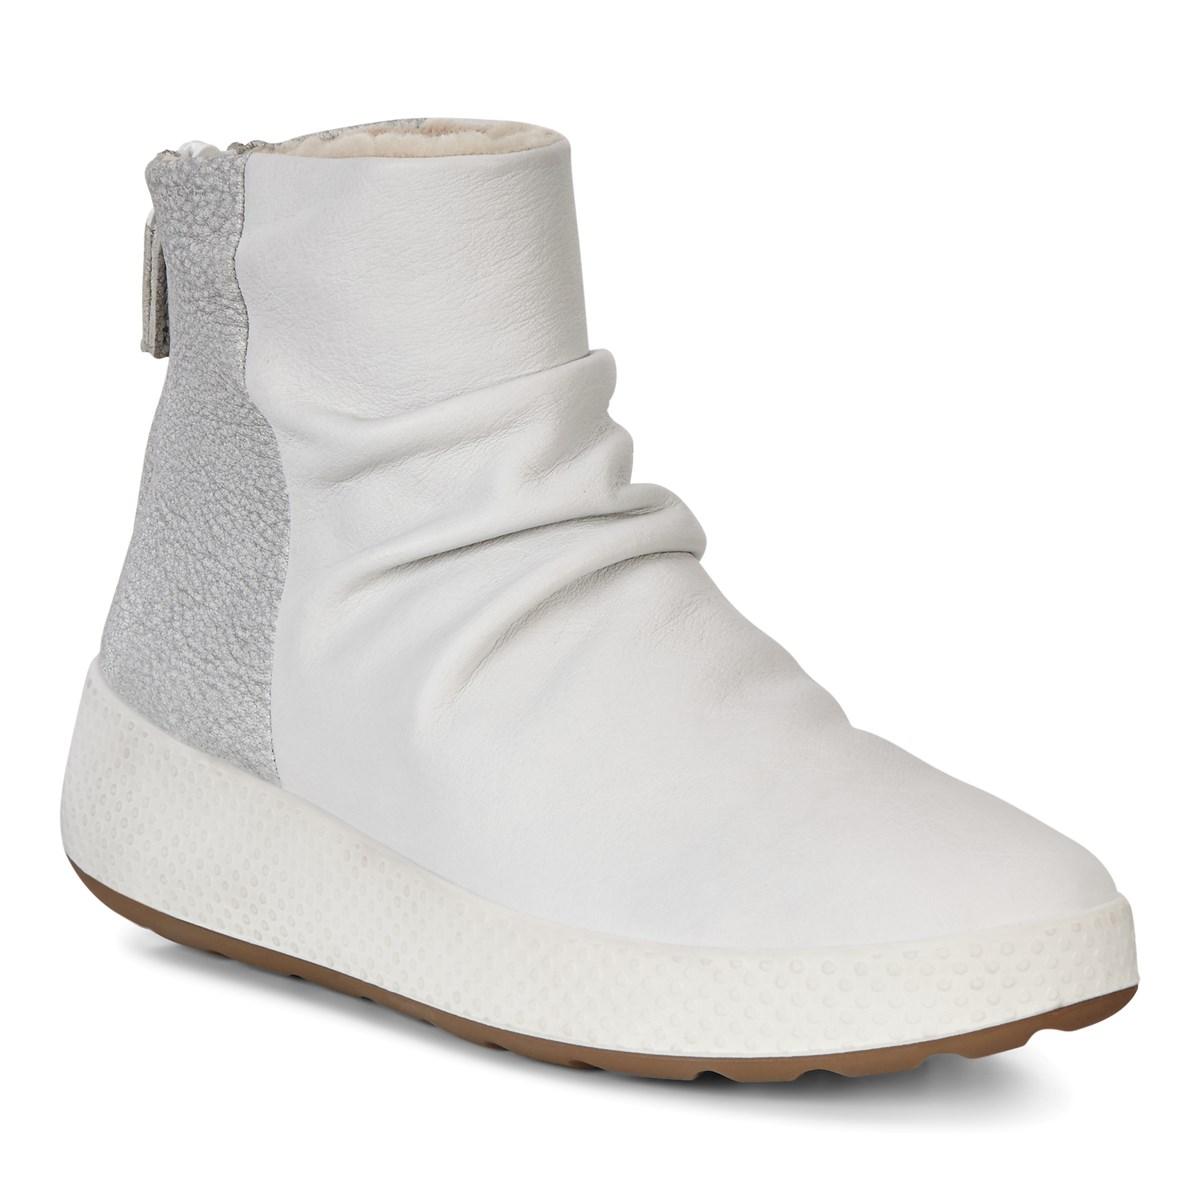 aliexpress pre order size 40 Boots - UKIUK - ECCO Shoes NZ